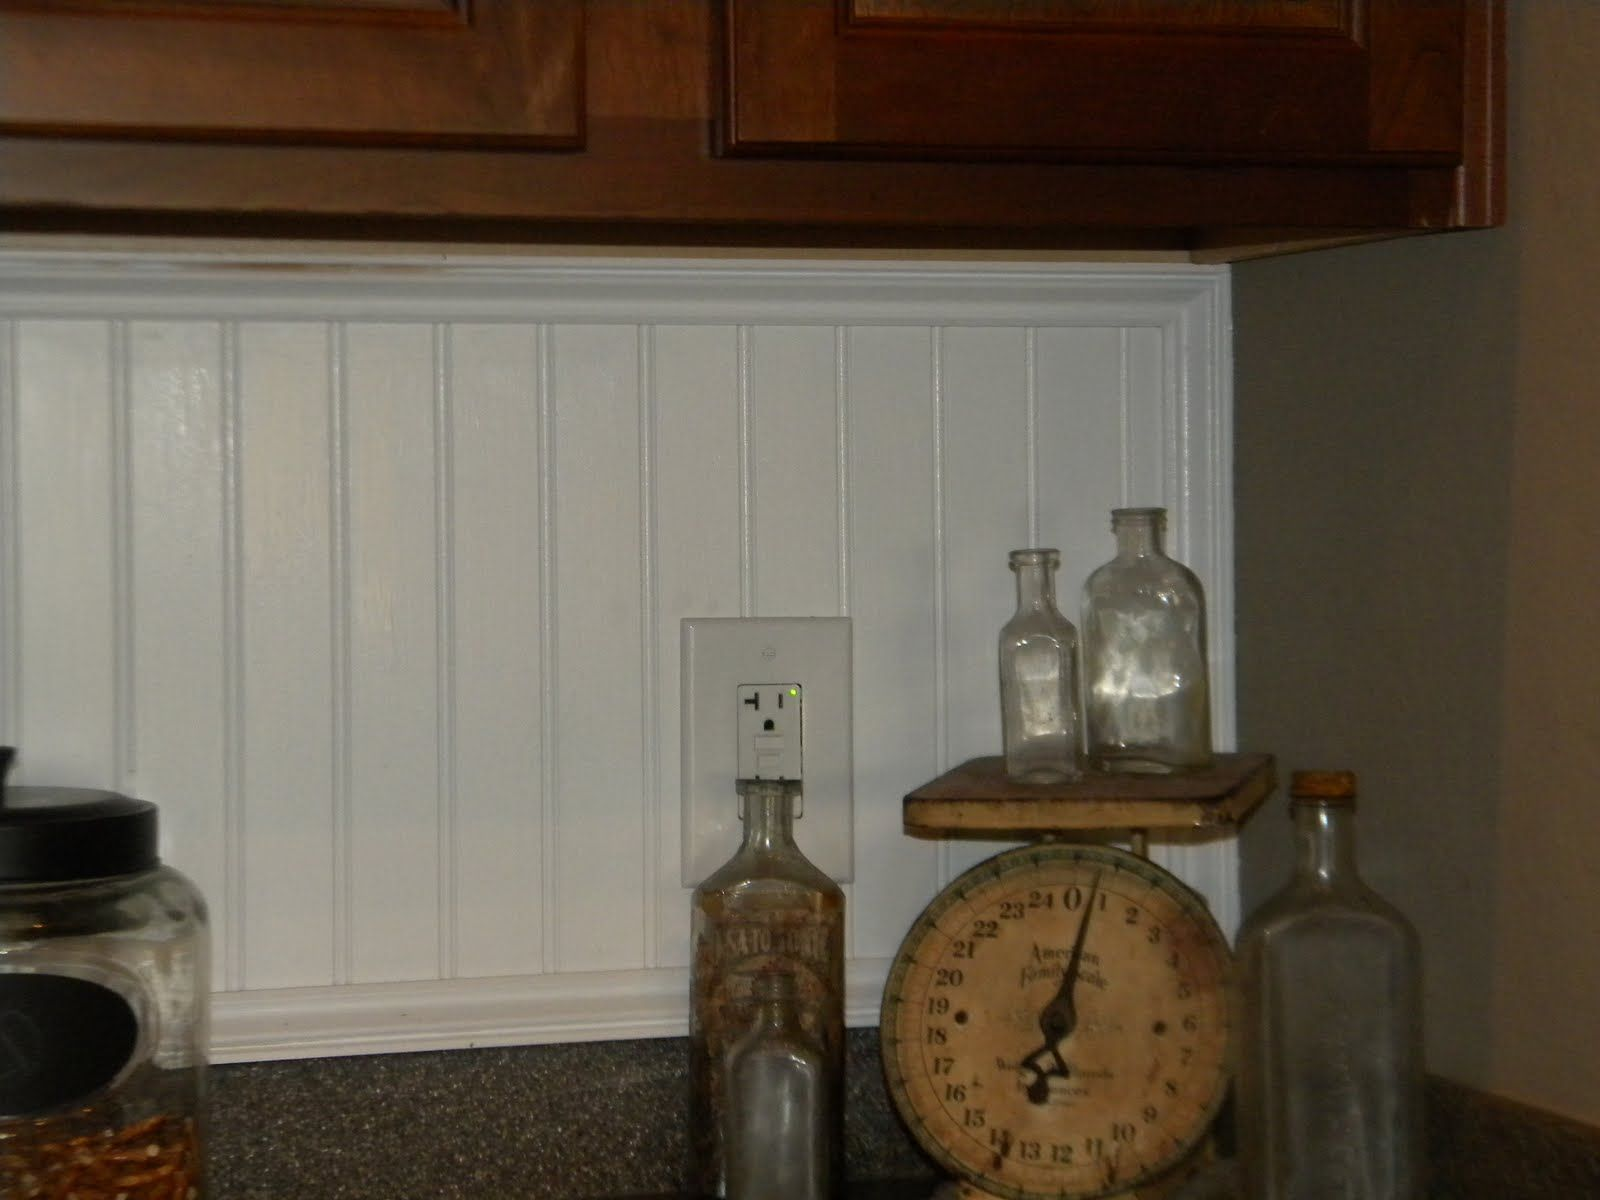 ^ 1000+ images about Kitchen Backsplash on Pinterest ountertops ...